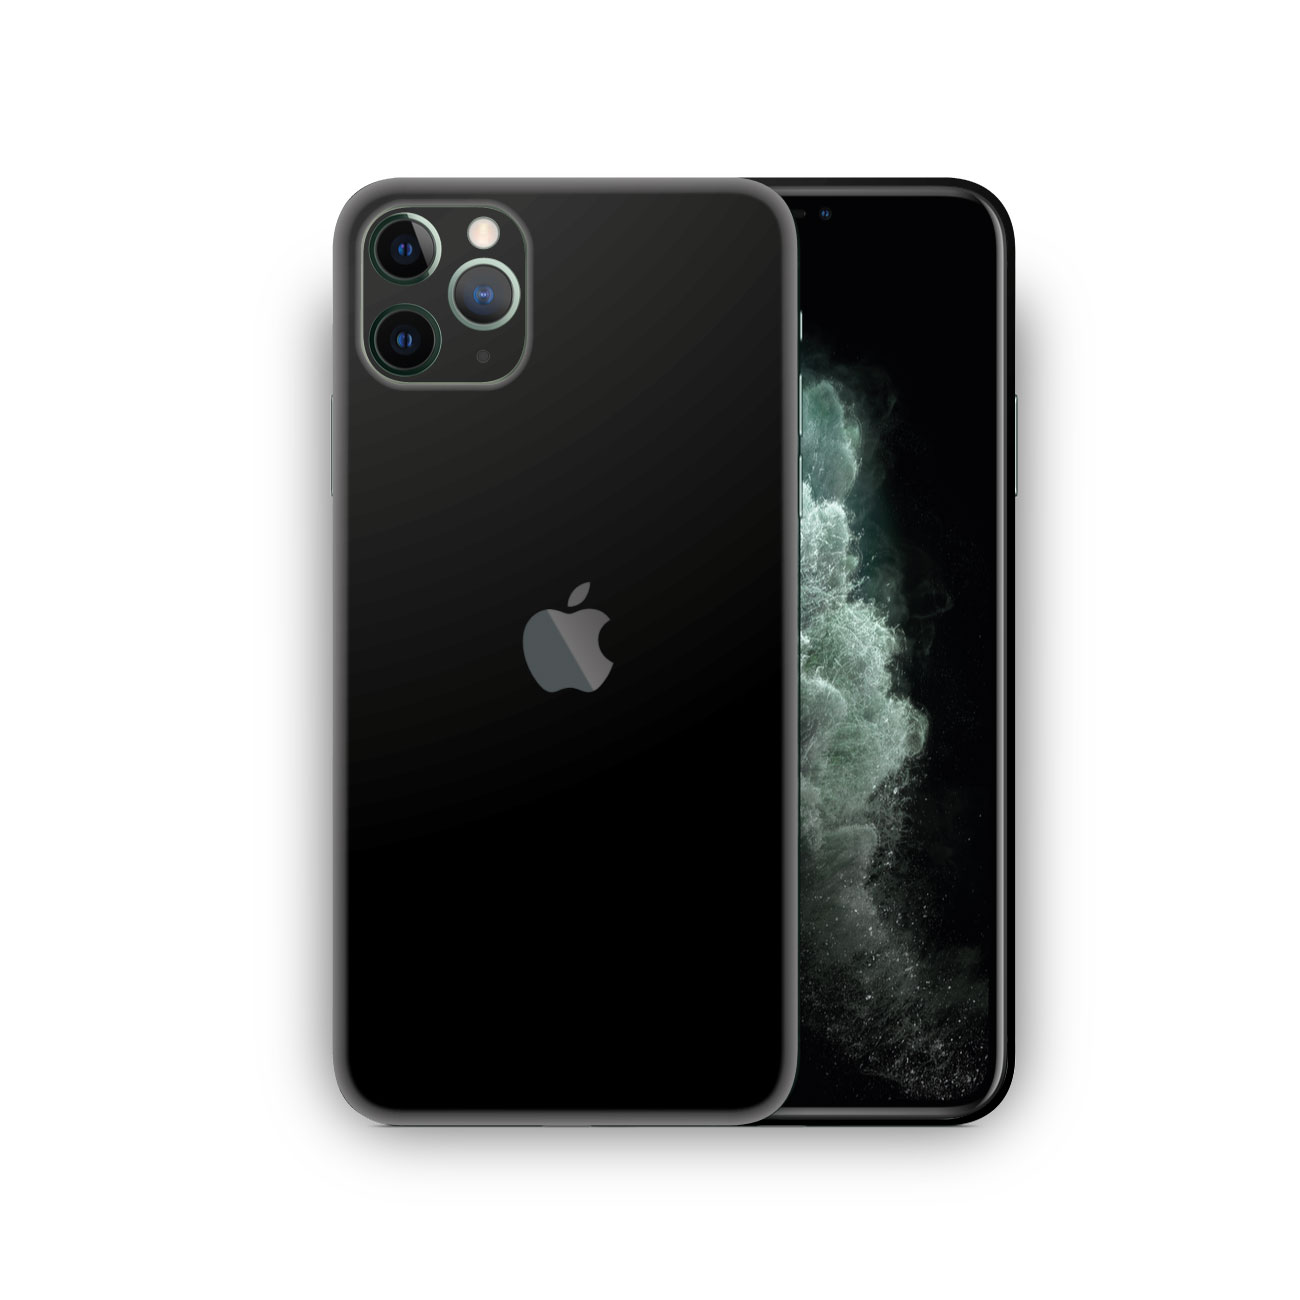 Apple iPhone 11 Pro Max Matte Black Vinyl Skin Wrap